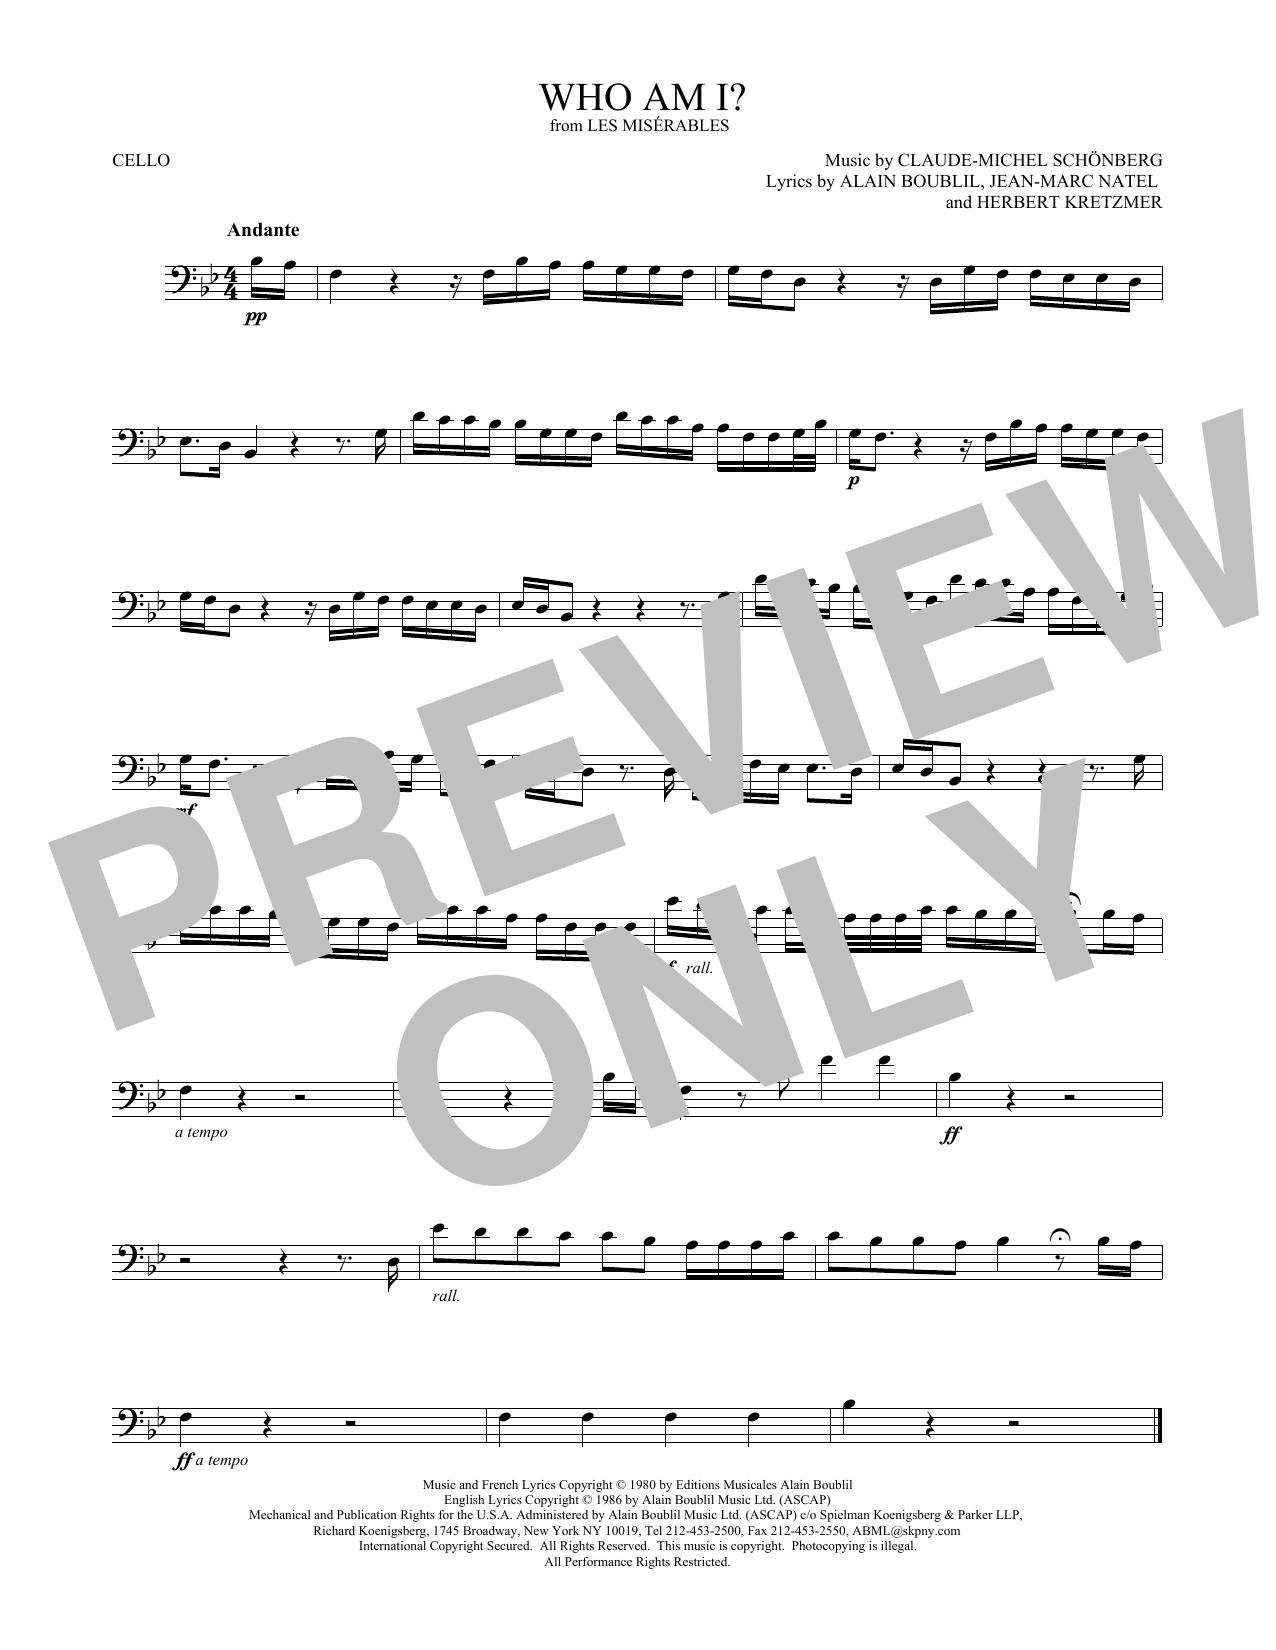 Who Am I? (Cello Solo)